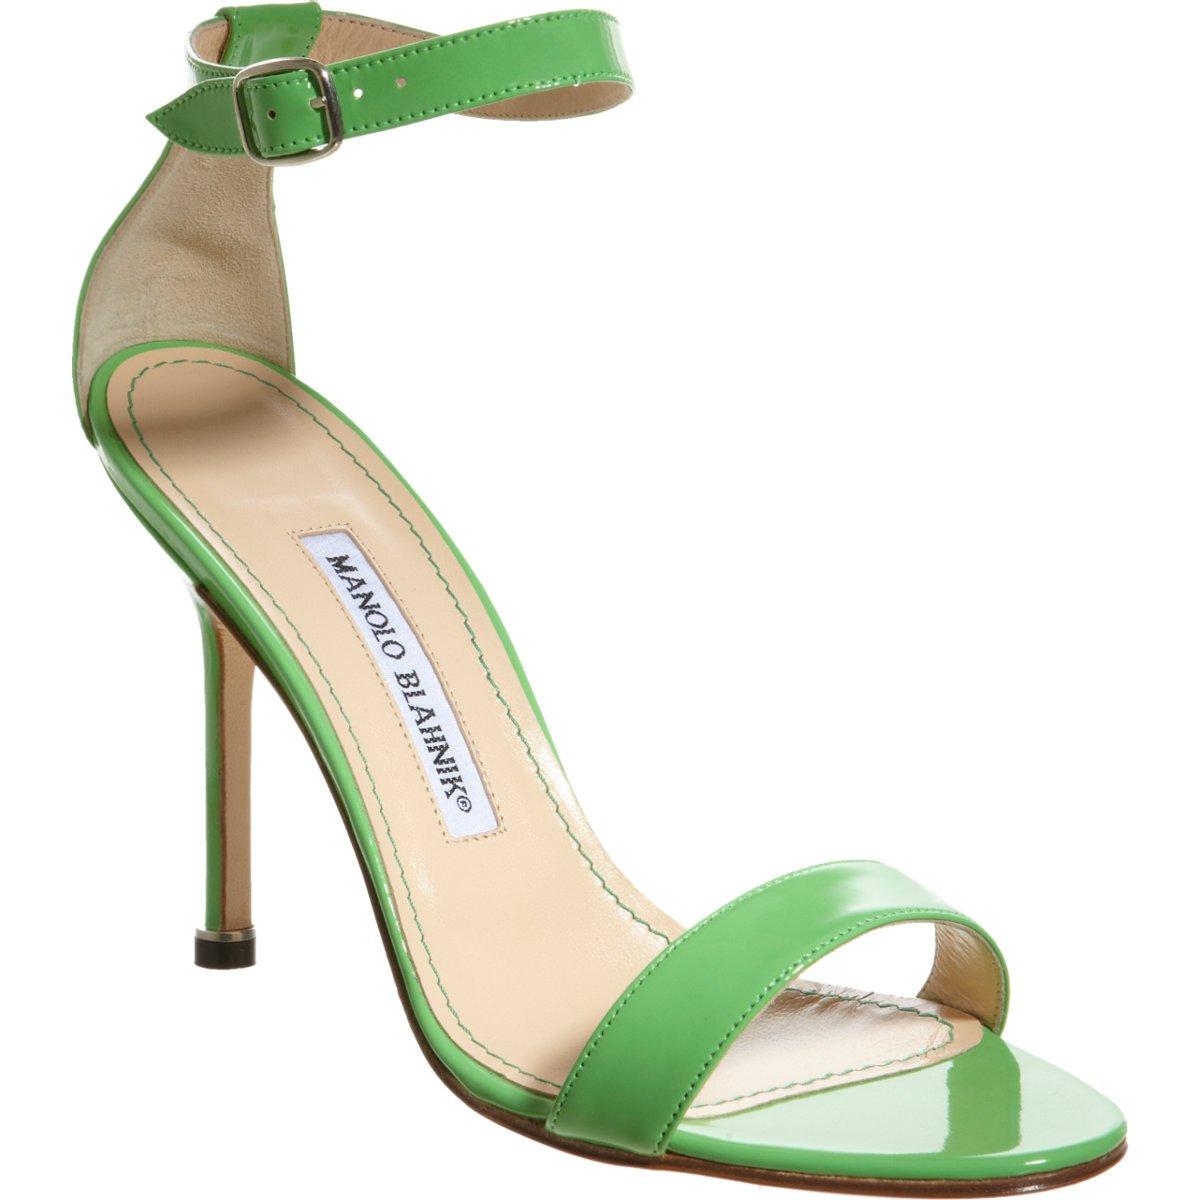 Shoeniverse: Chaos green patent sandals